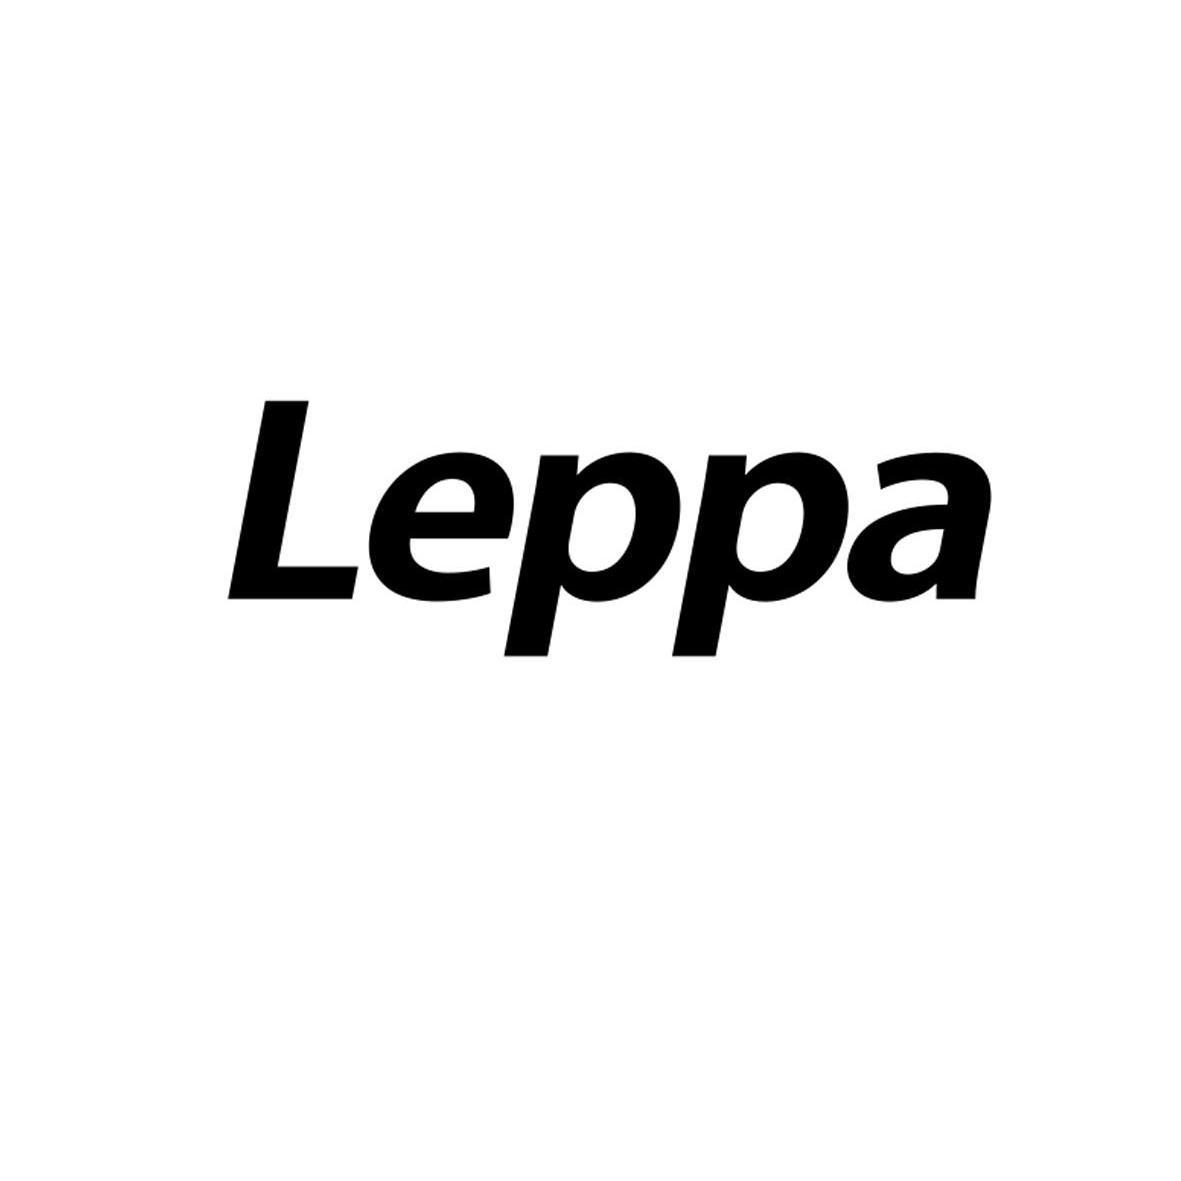 LEPPA